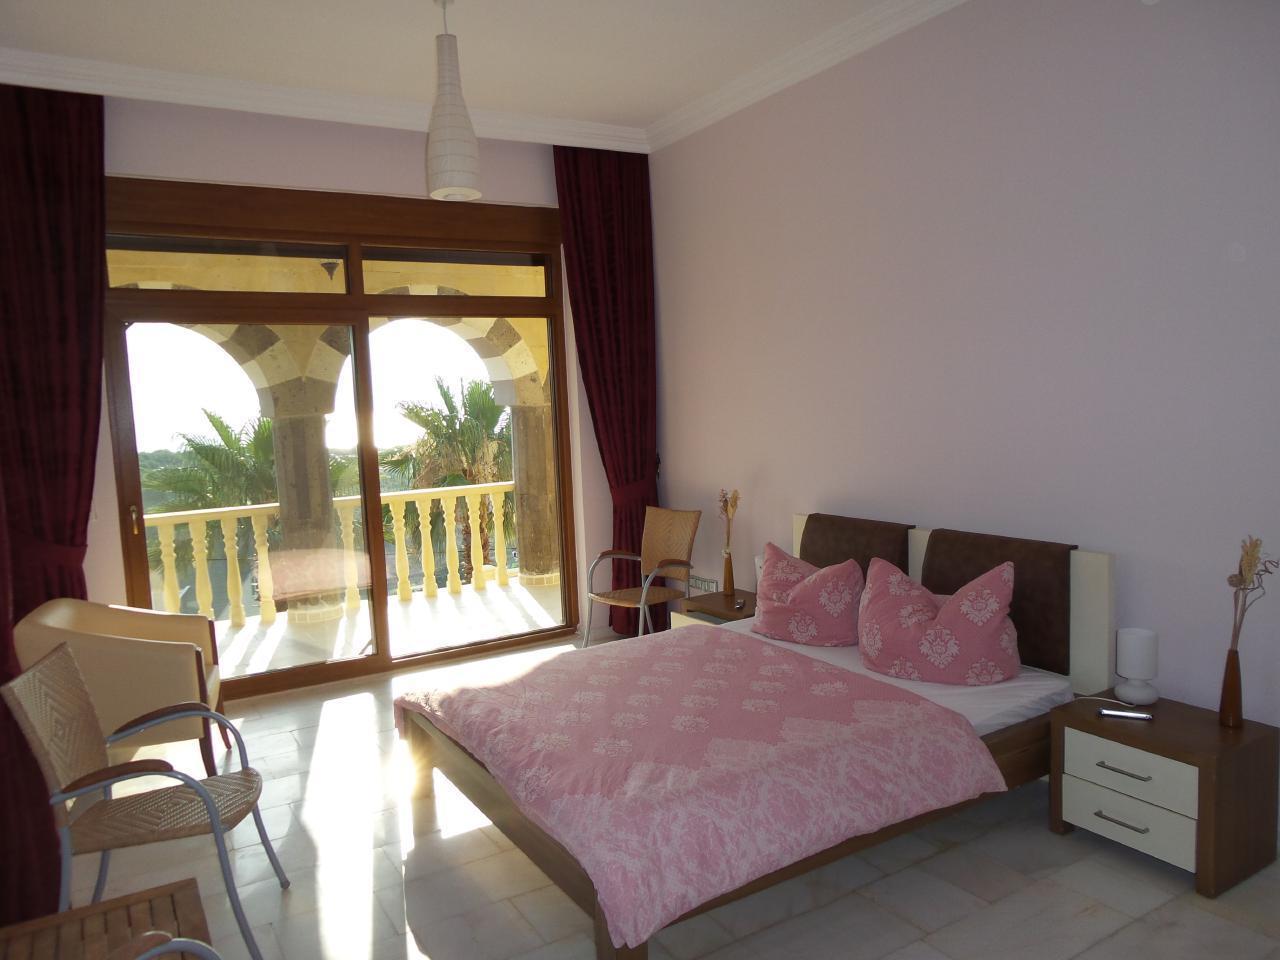 Ferienhaus Villa Gazipasa/Alanya-Gazipasa 200 Meter vom Meer (728528), Gazipasa, , Mittelmeerregion, Türkei, Bild 5